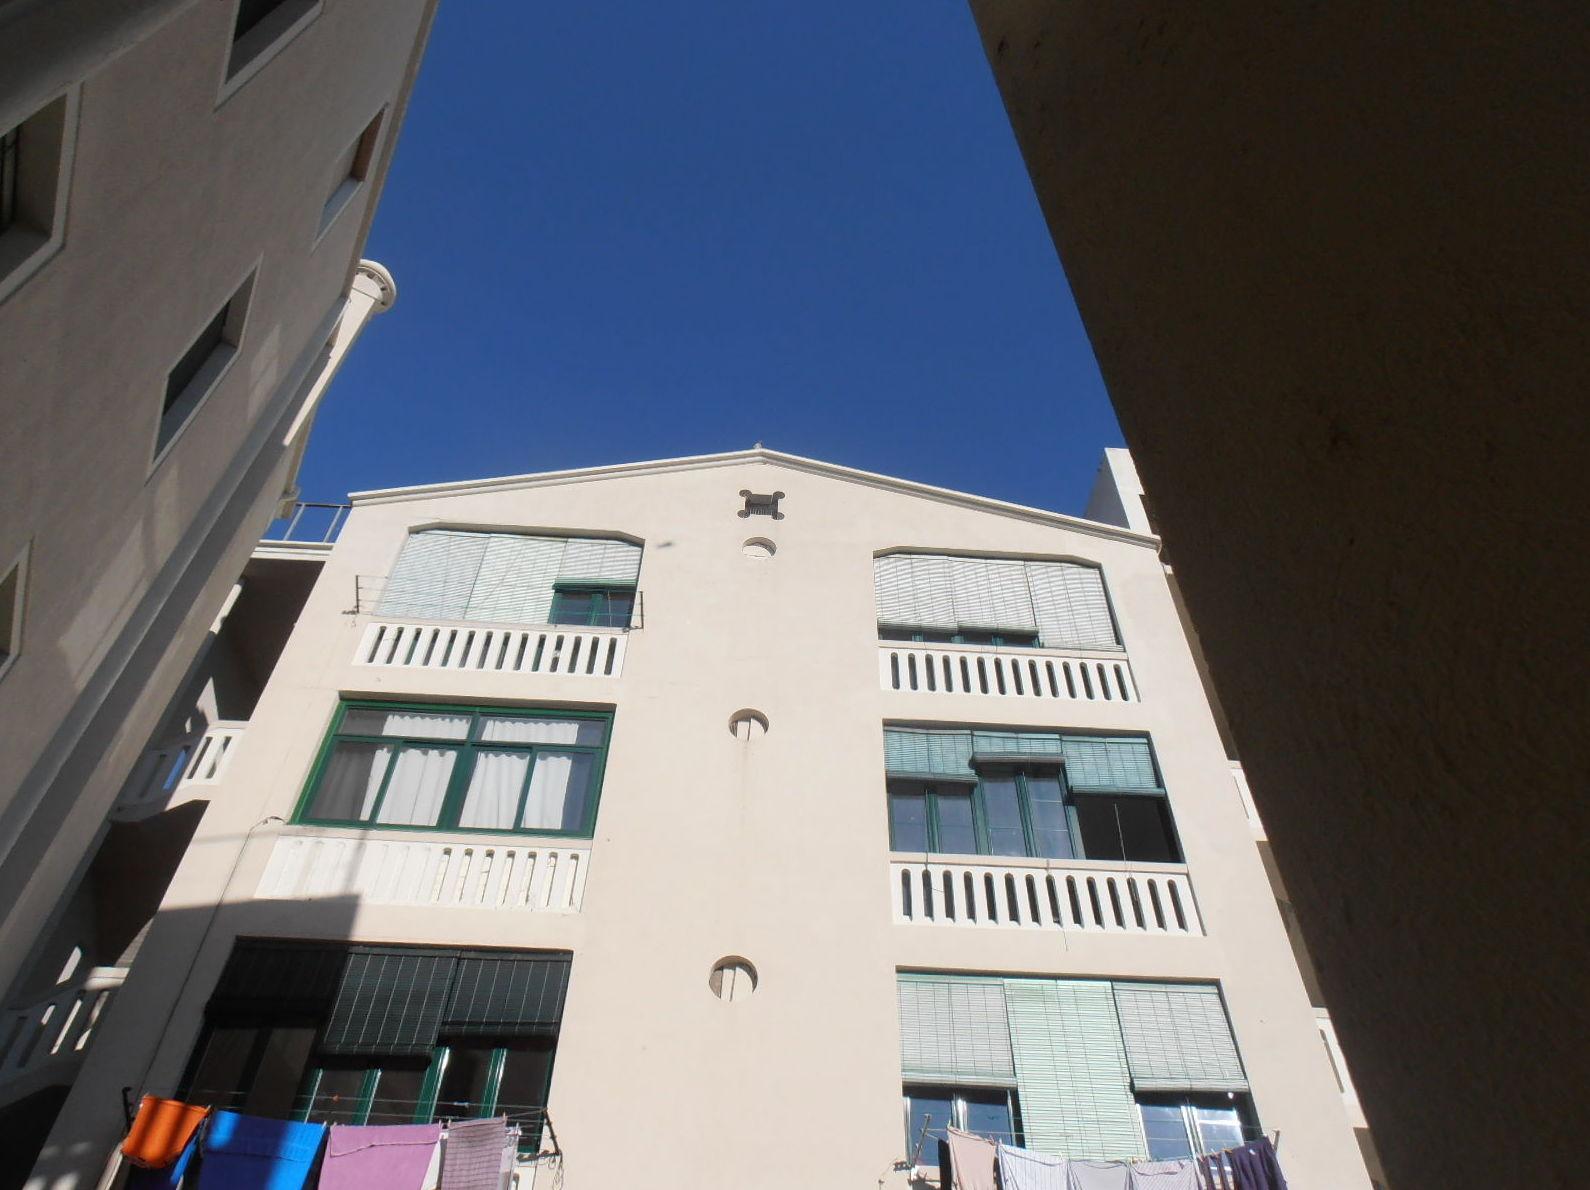 Venta de viviendas rehabilitadas en Sant Feliu de Llobregat